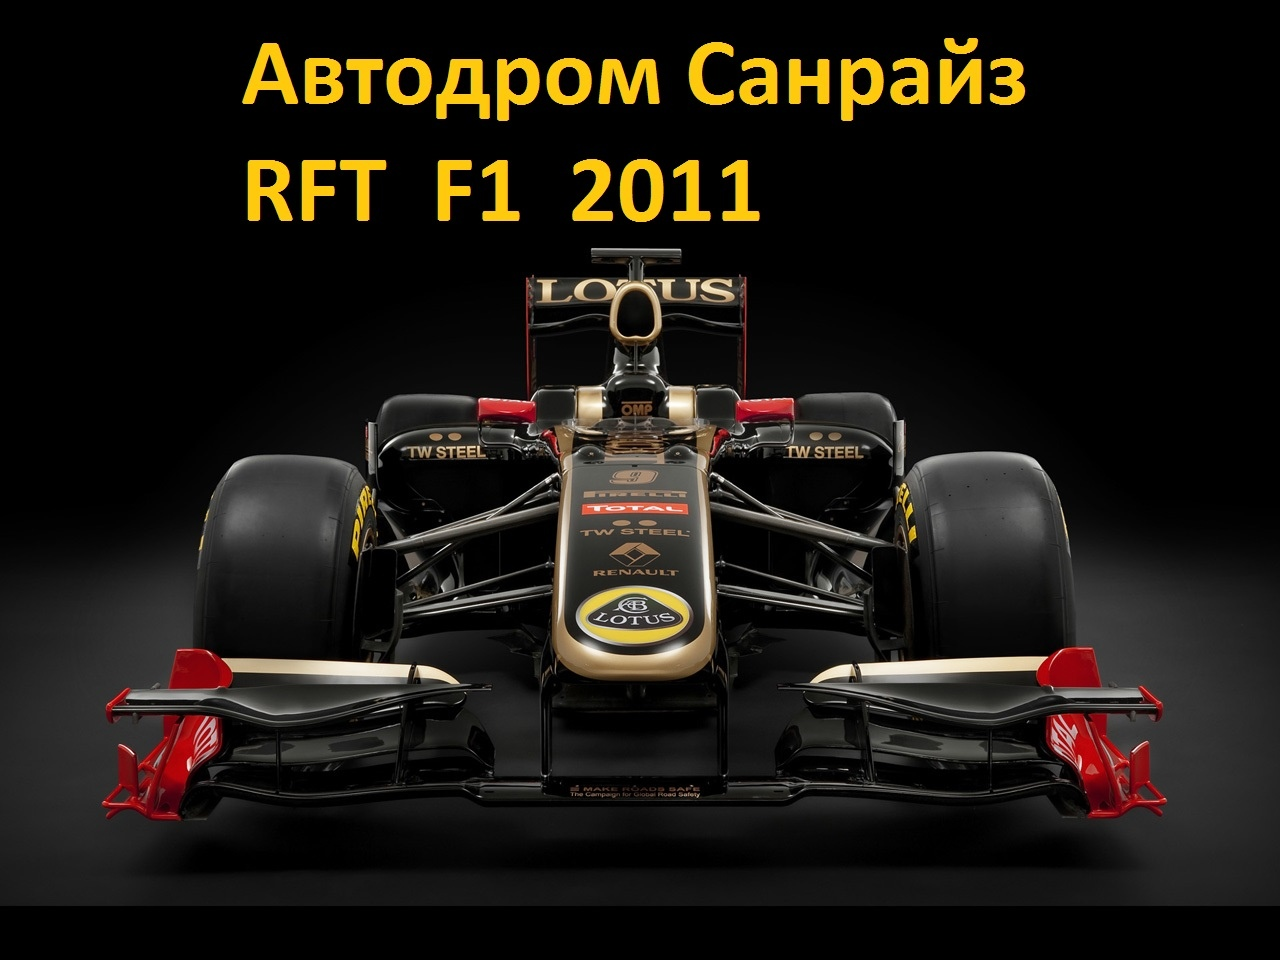 Гонки.МЕ Автодром Санрайз Ф1 РФТ 2011 Ф1 РФТ 2011